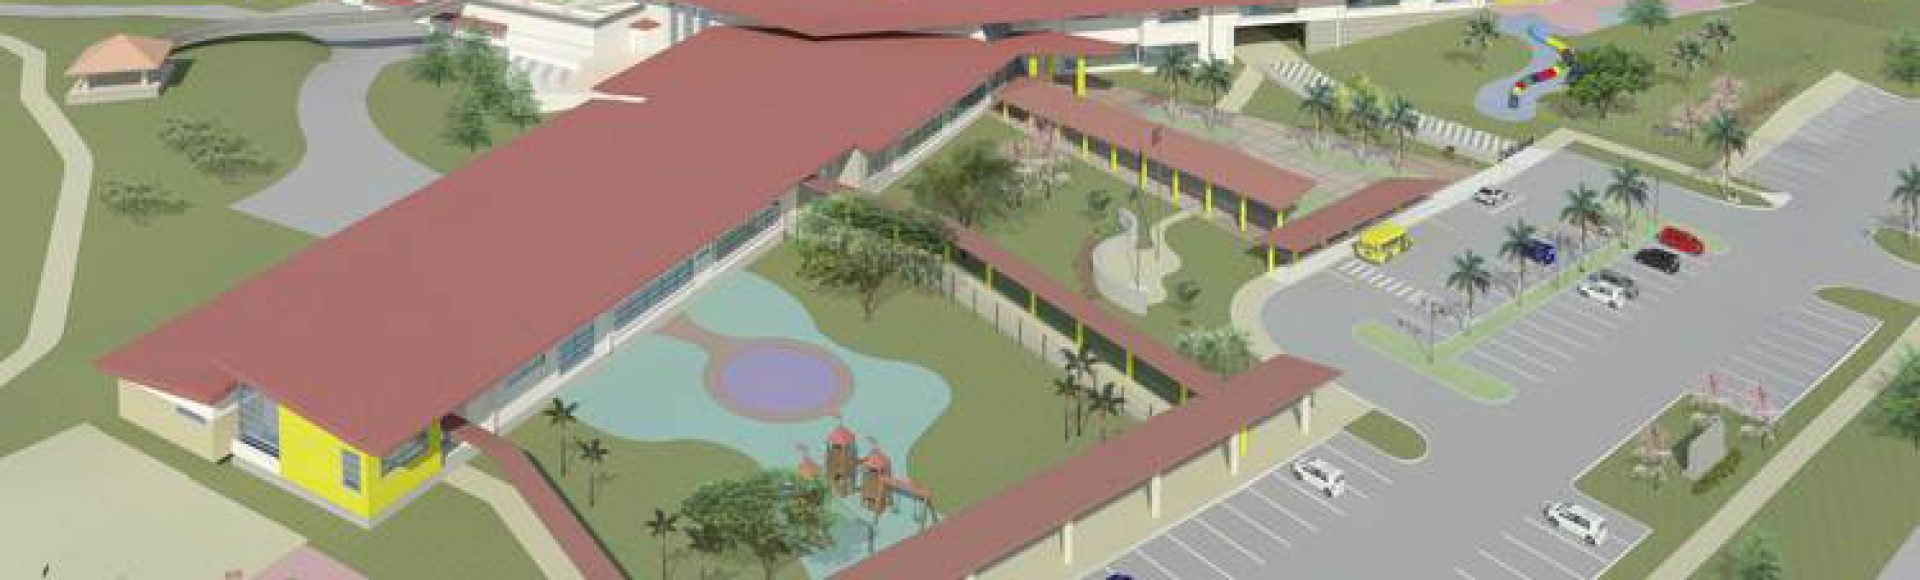 Okinawa Zukeran Elementary School